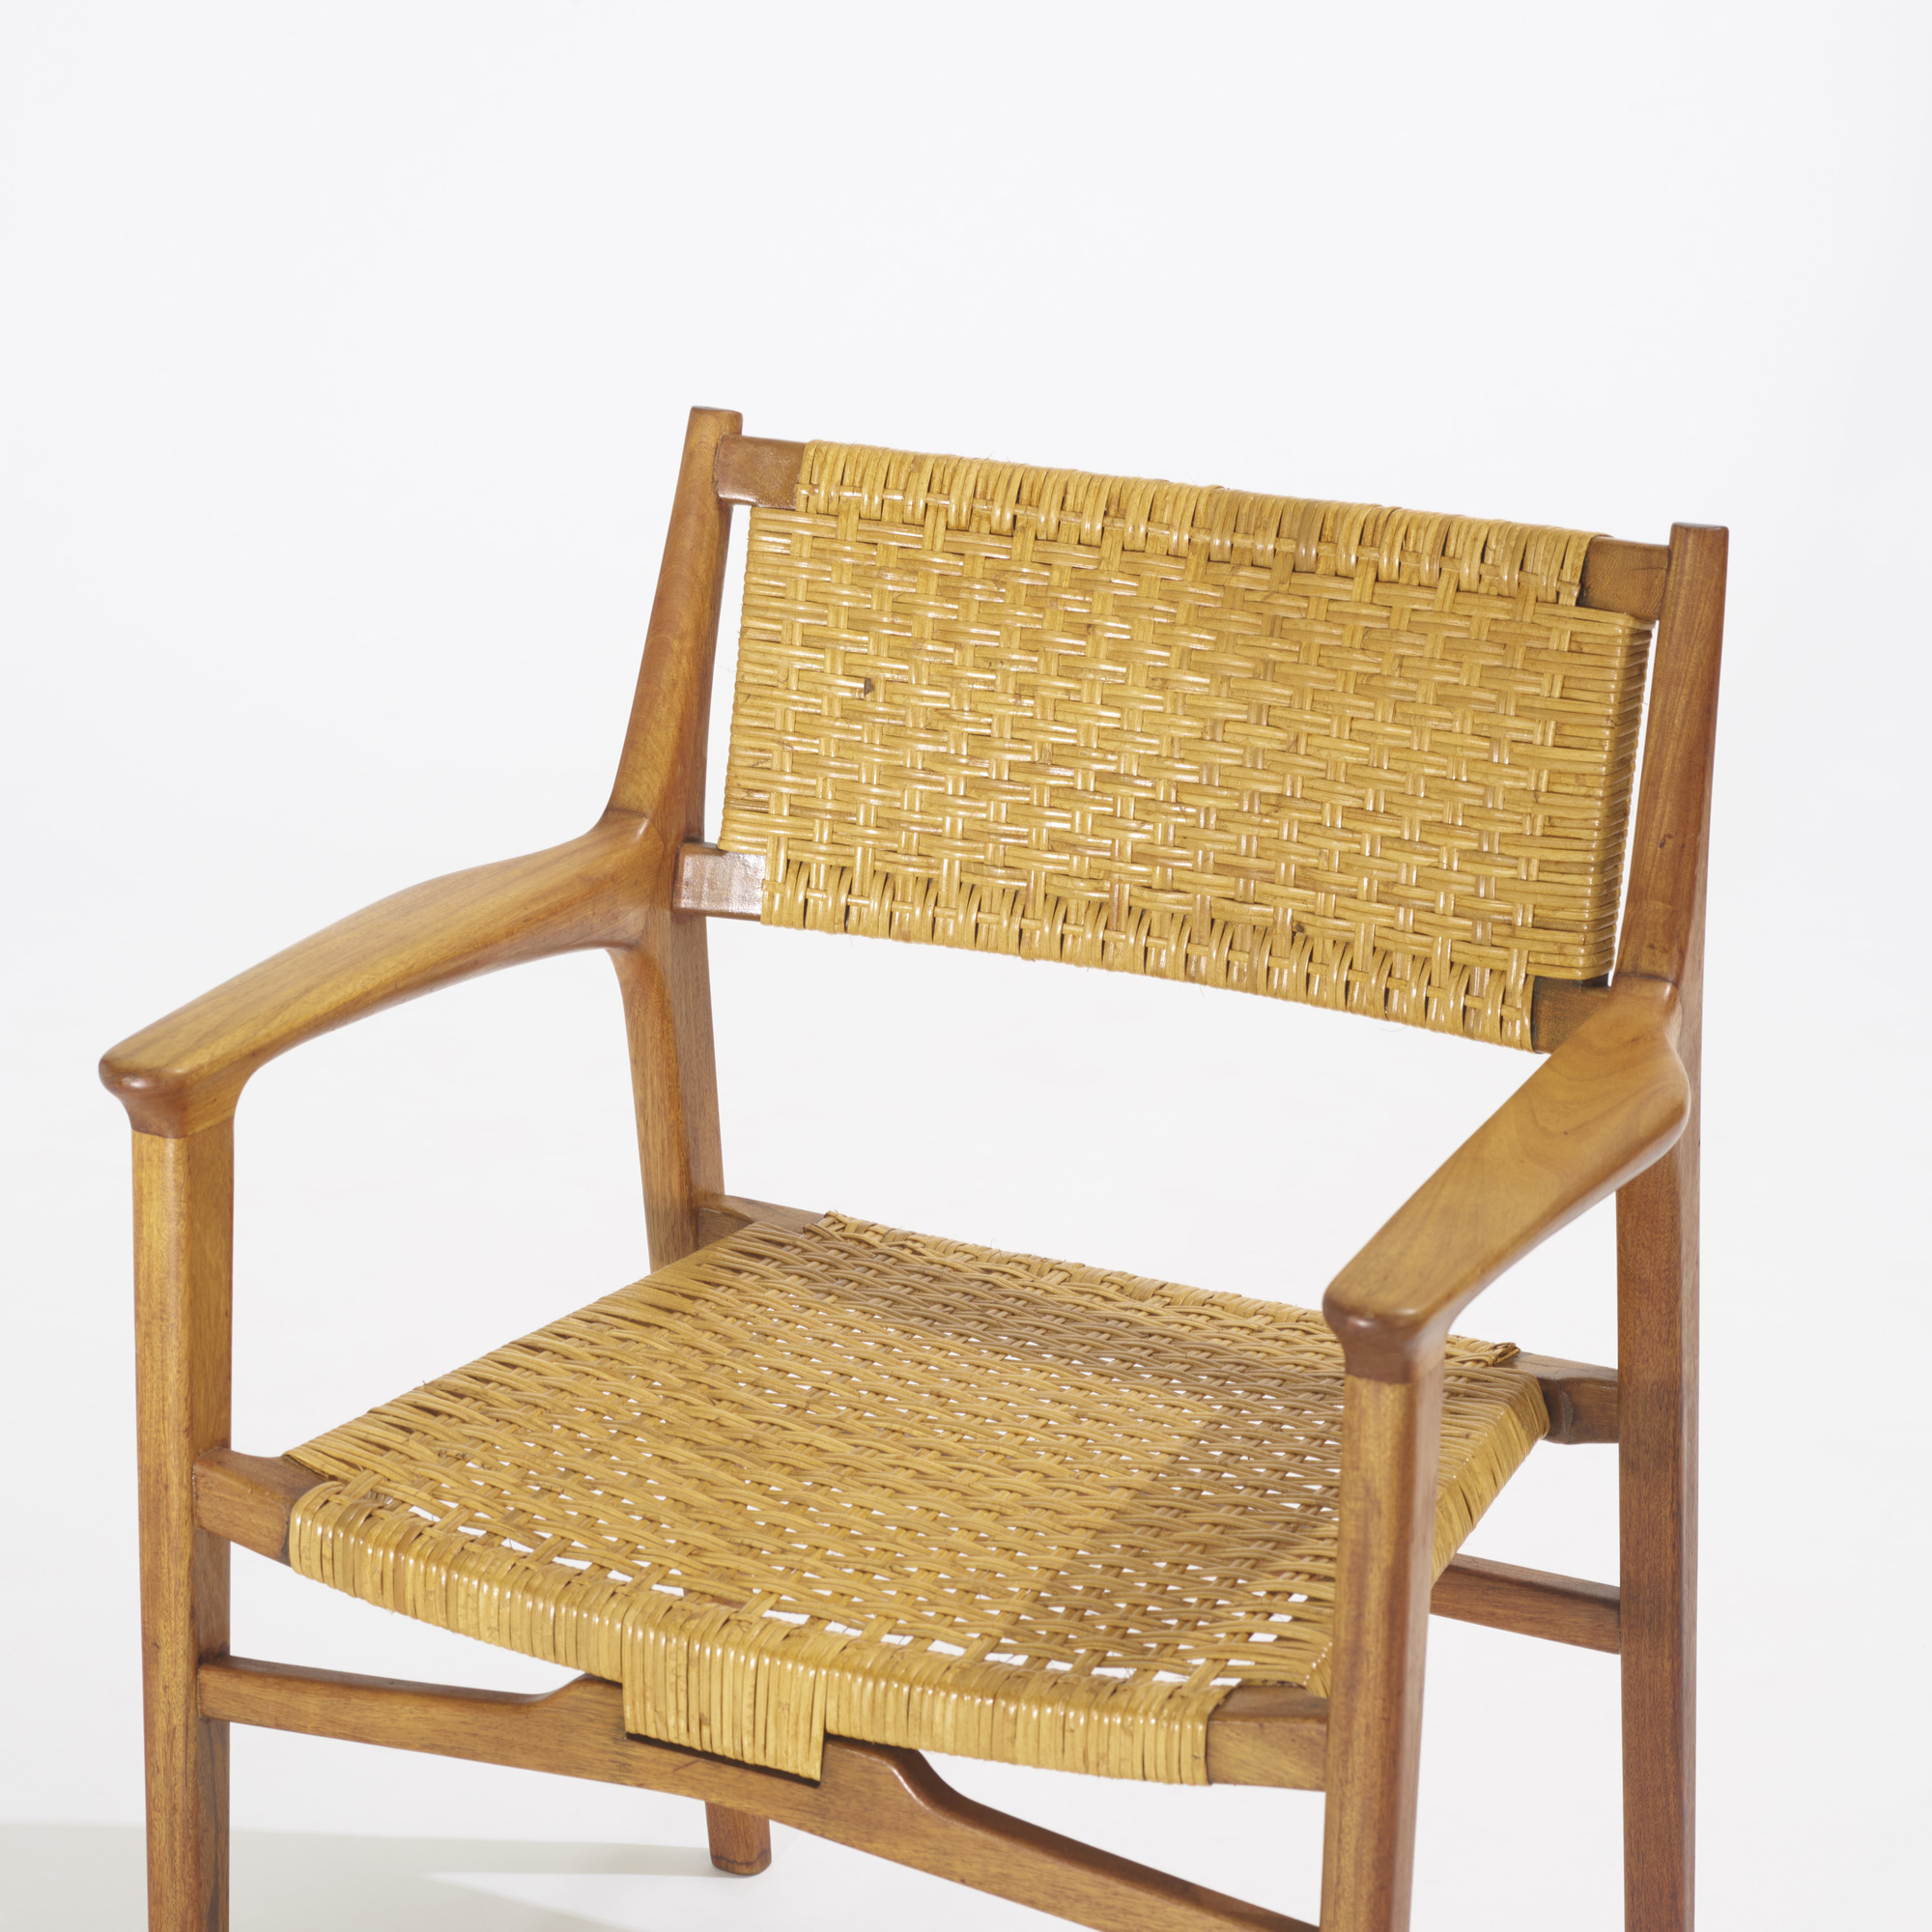 233: Hans J. Wegner / rare lounge chairs, pair (3 of 3)